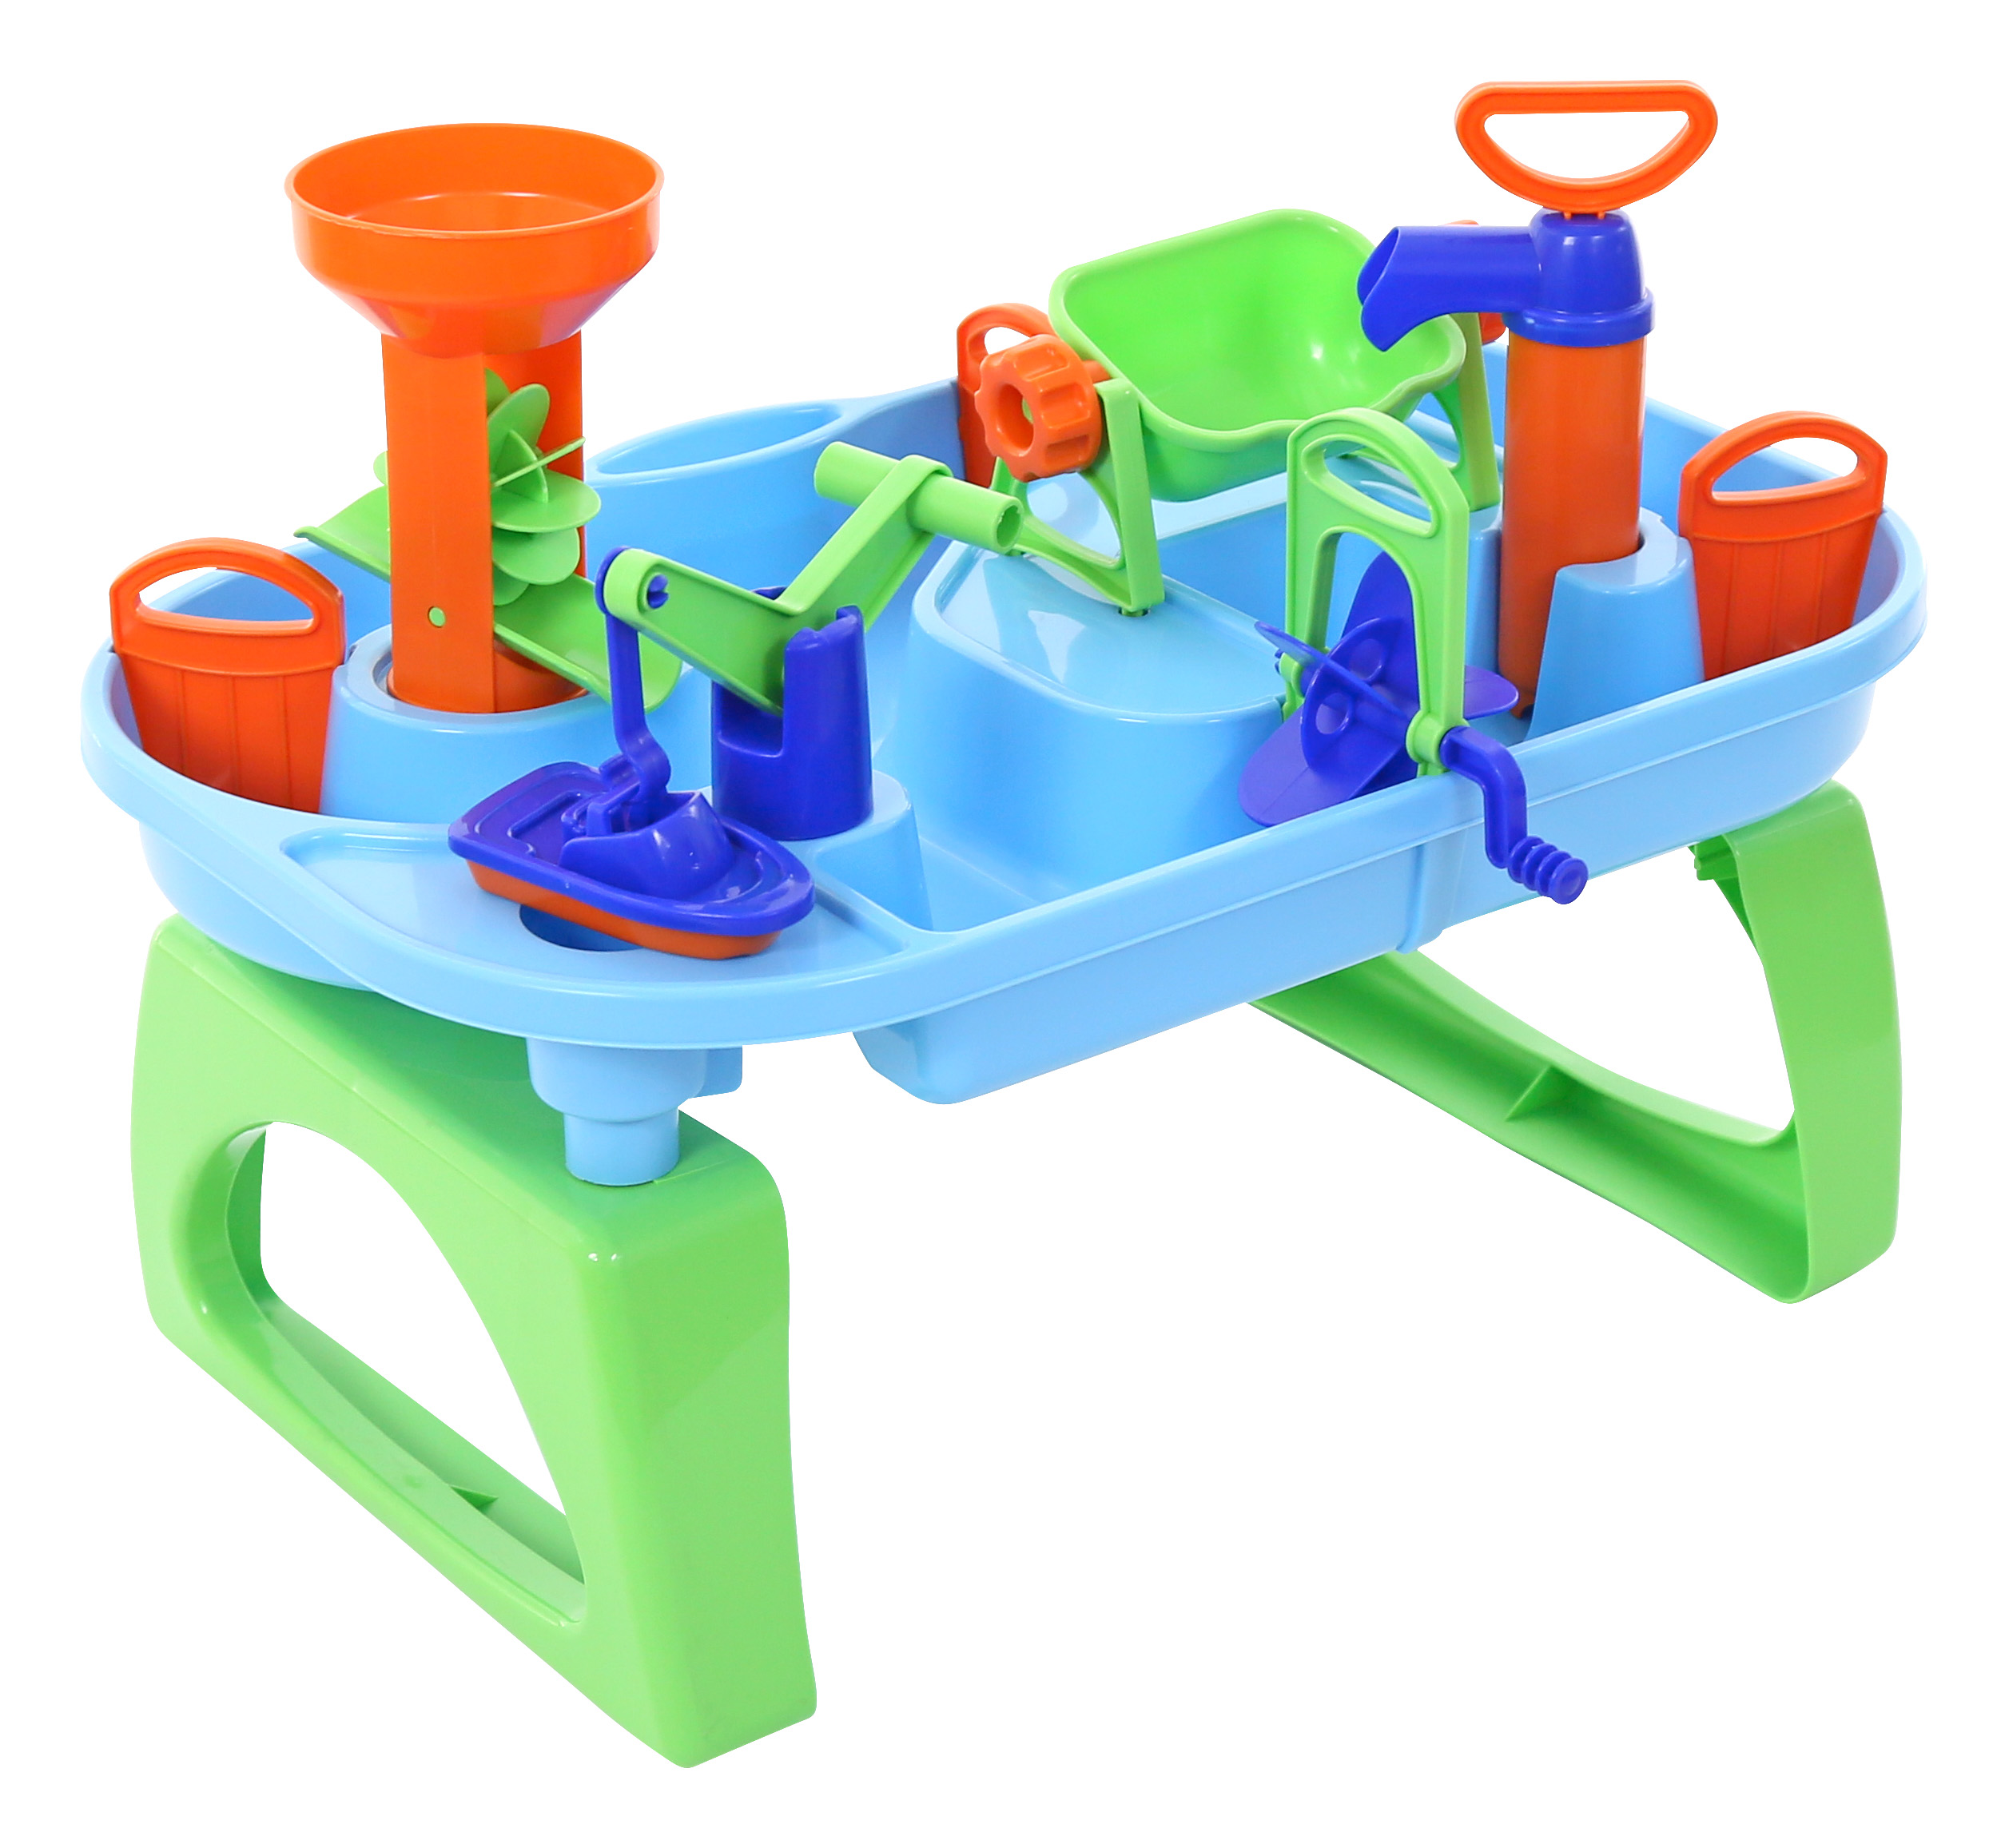 WADER WADER WODNY WORLD - TABUĽKA Sada hračiek do vane